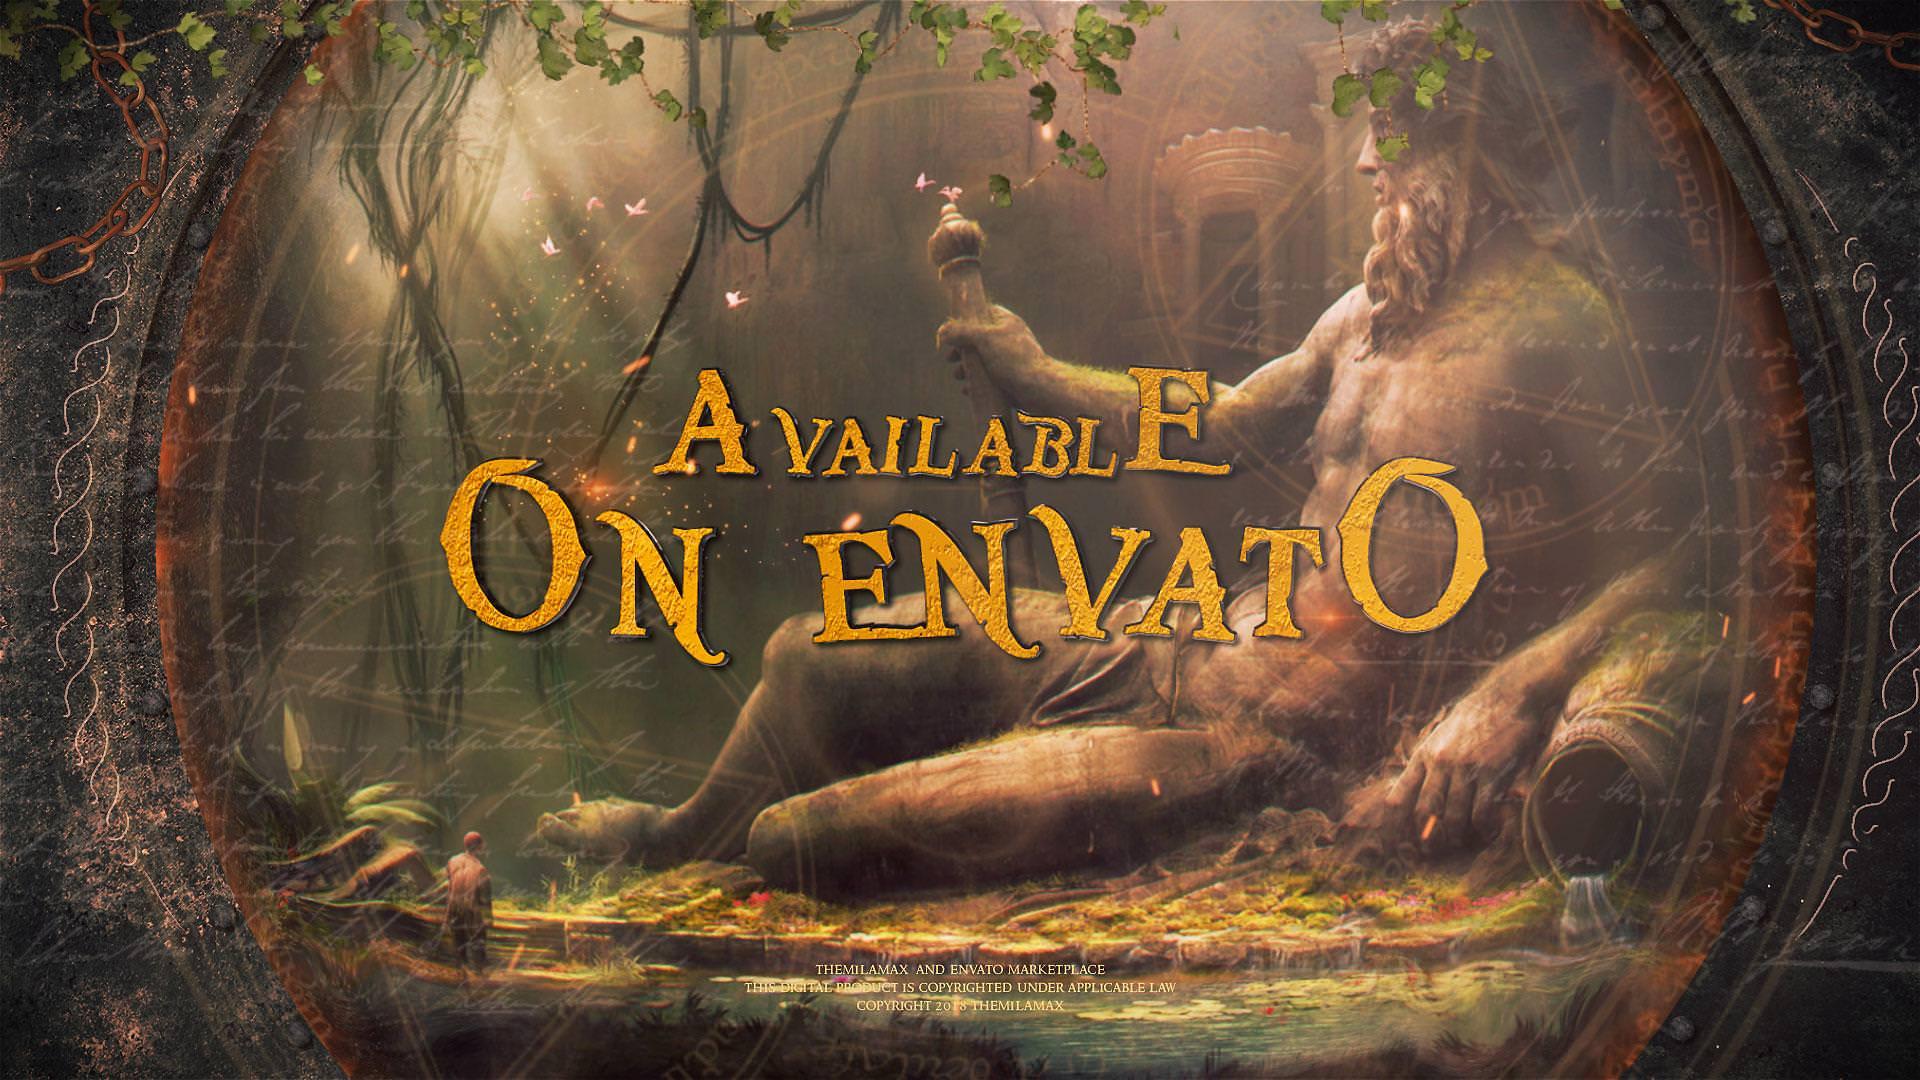 Fantasy Trailer 2 - 12